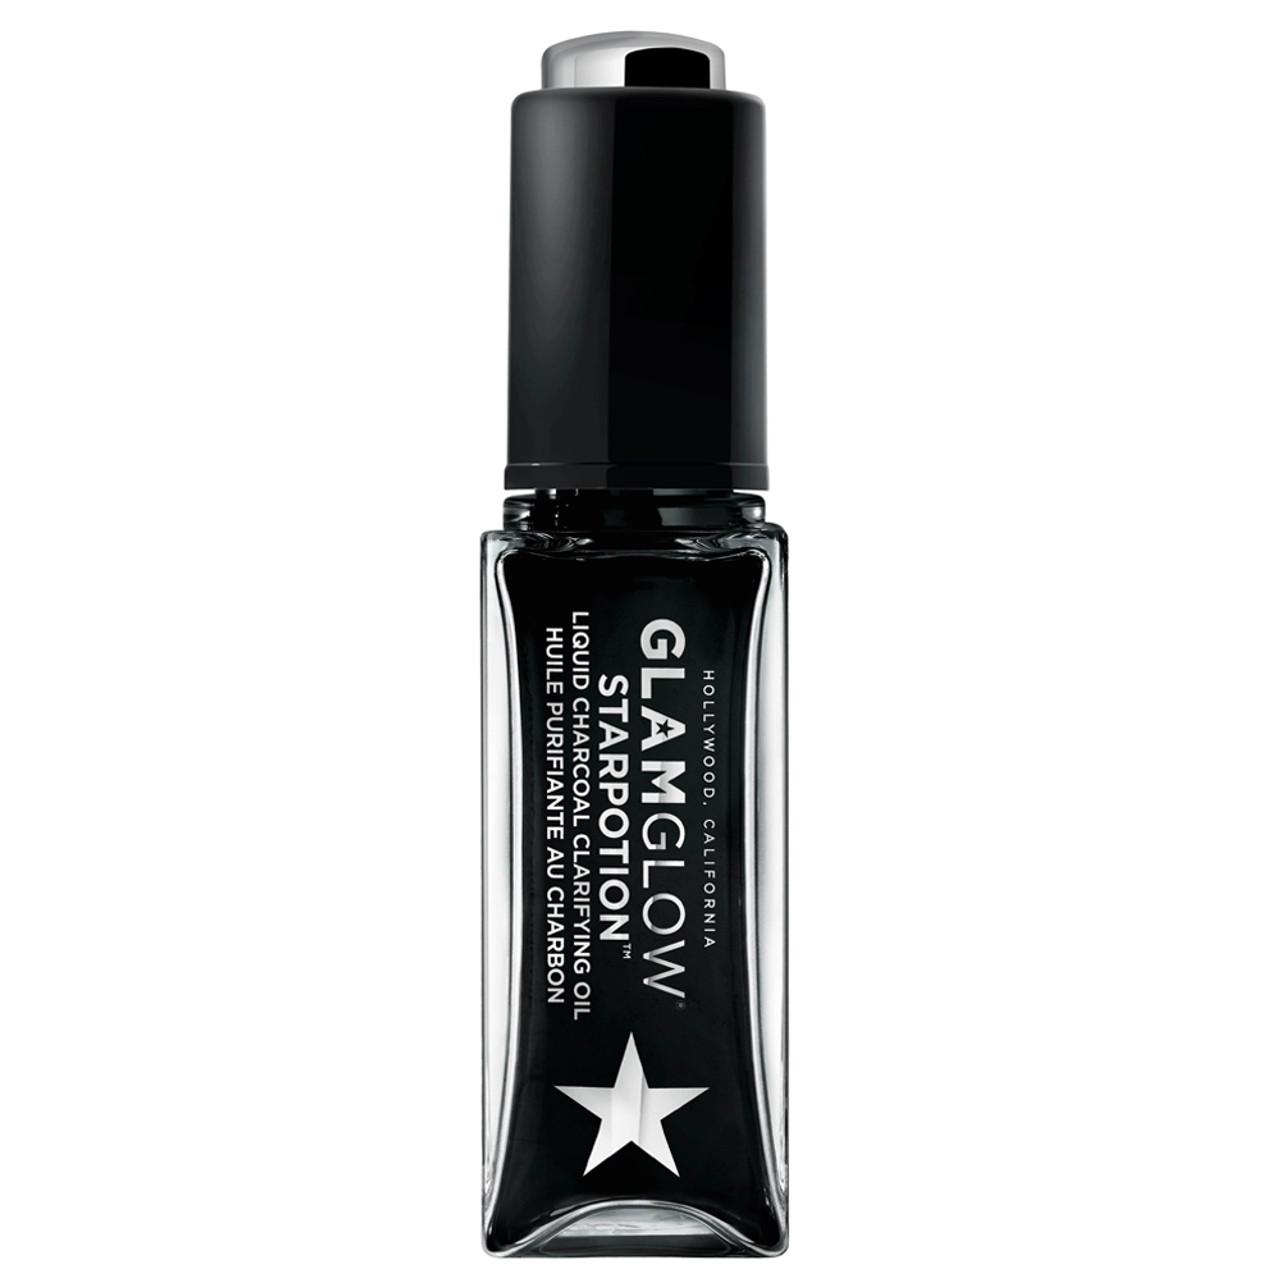 GlamGlow Starpotion Liquid Charcoal Clarifying Oil